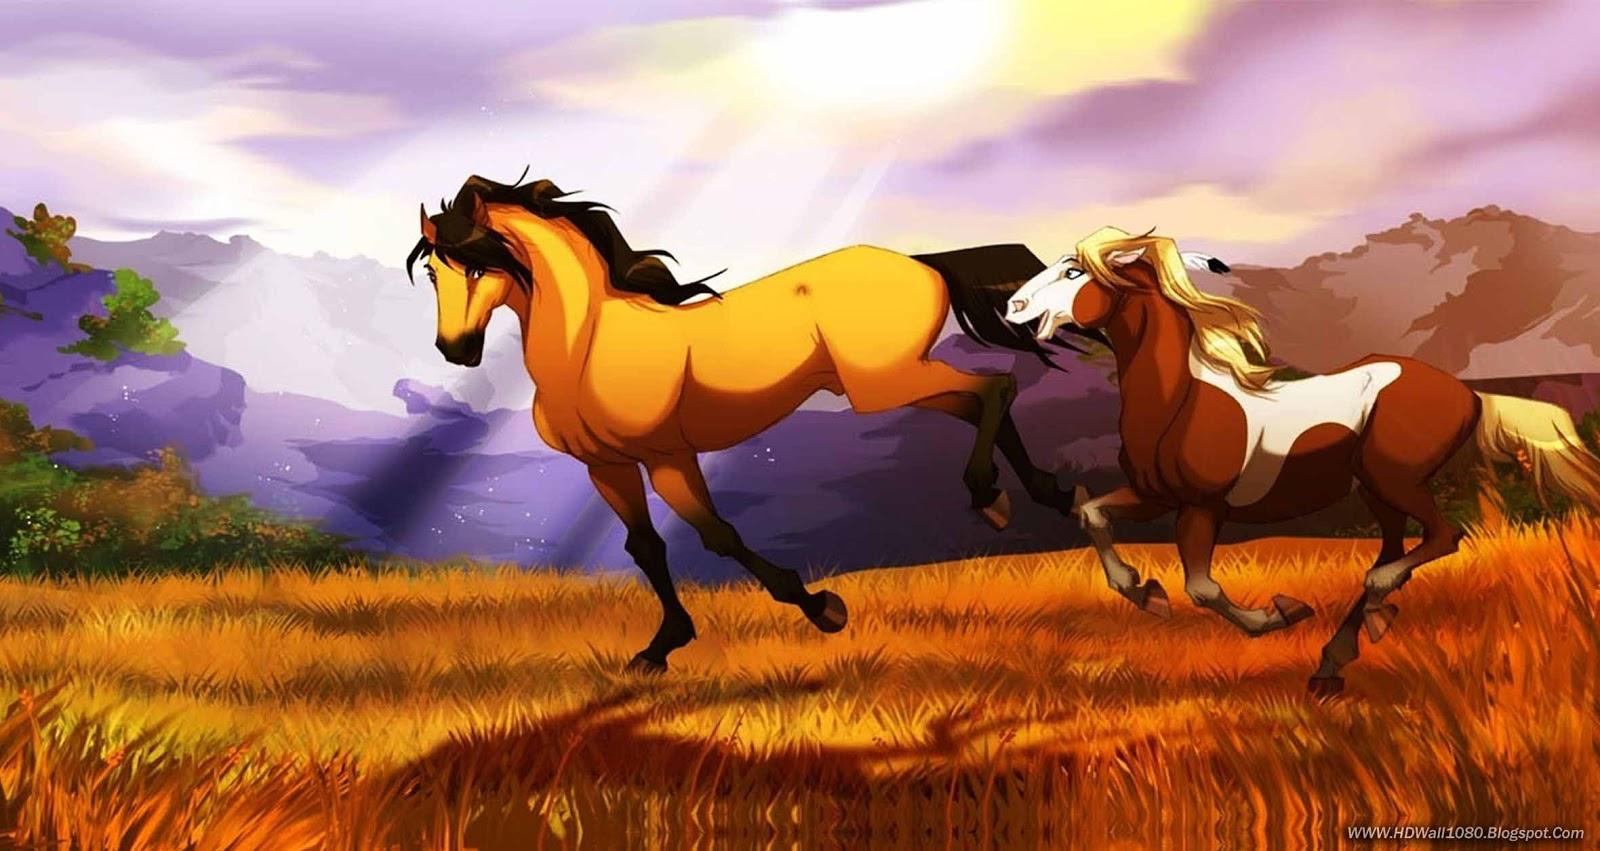 Spirit Stallion Of The Cimarron Painting At Paintingvalley Com